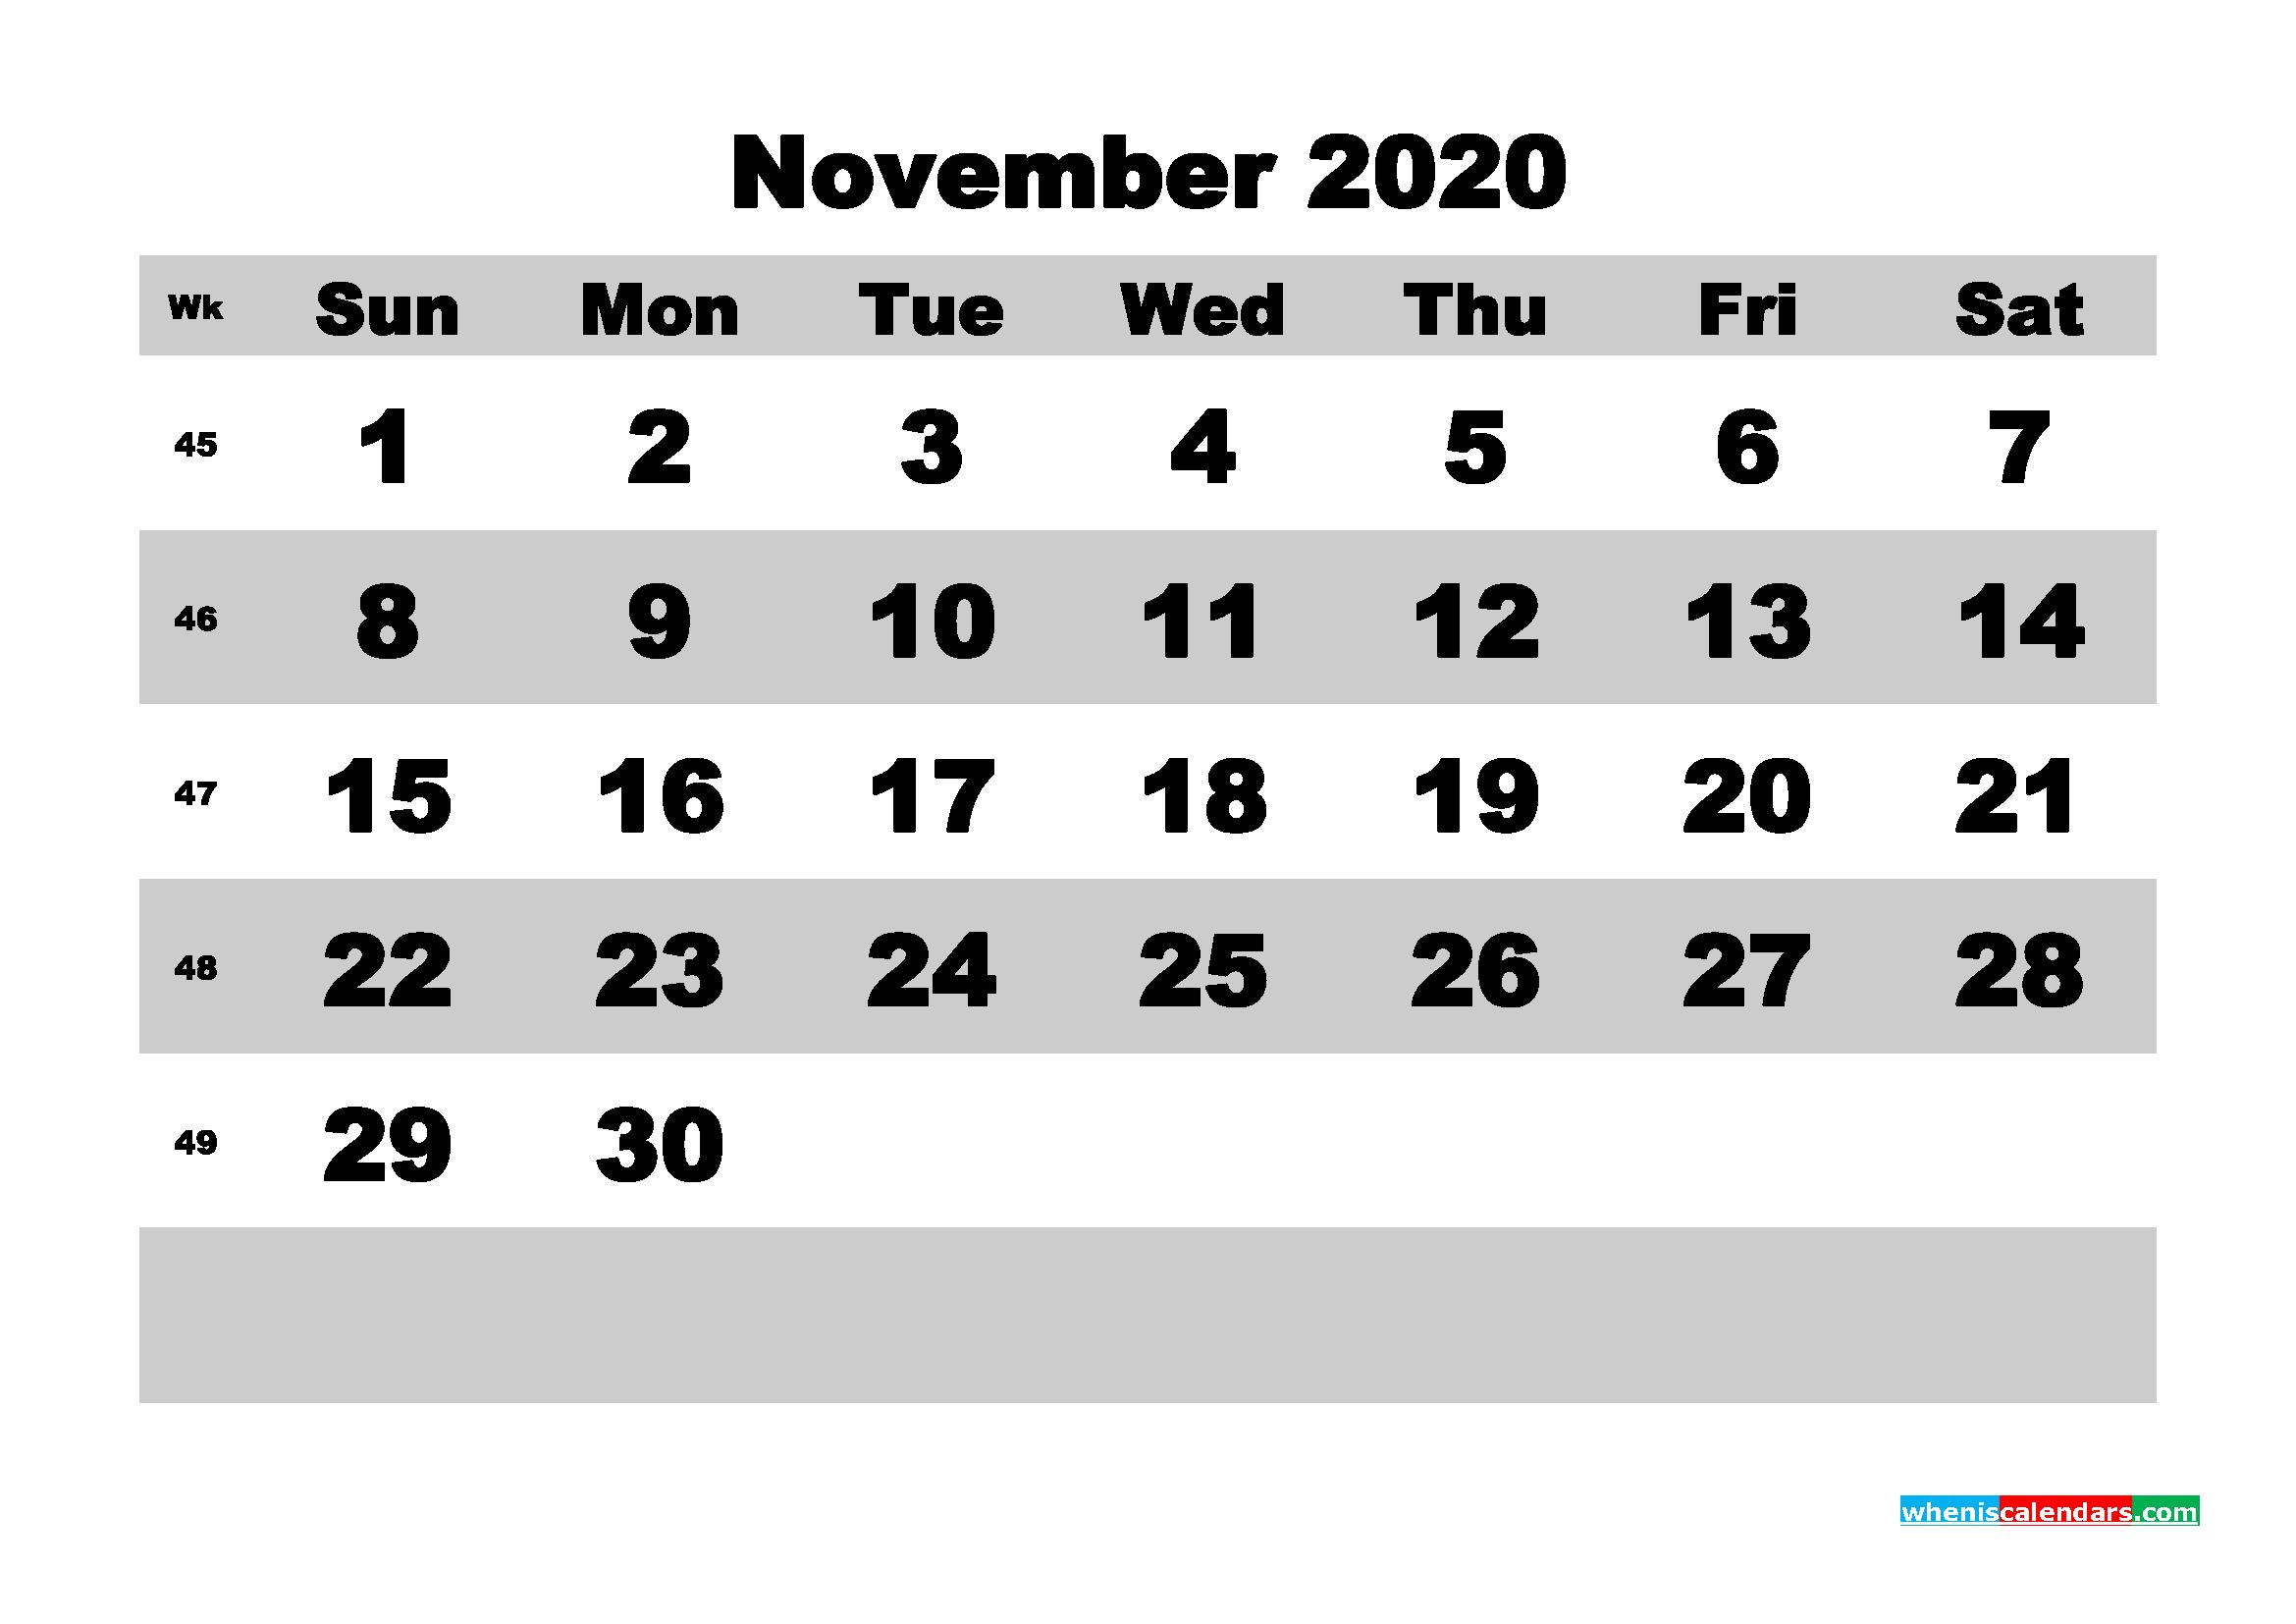 November Printable Calendar 2020 PDF, Word - No.m20b599